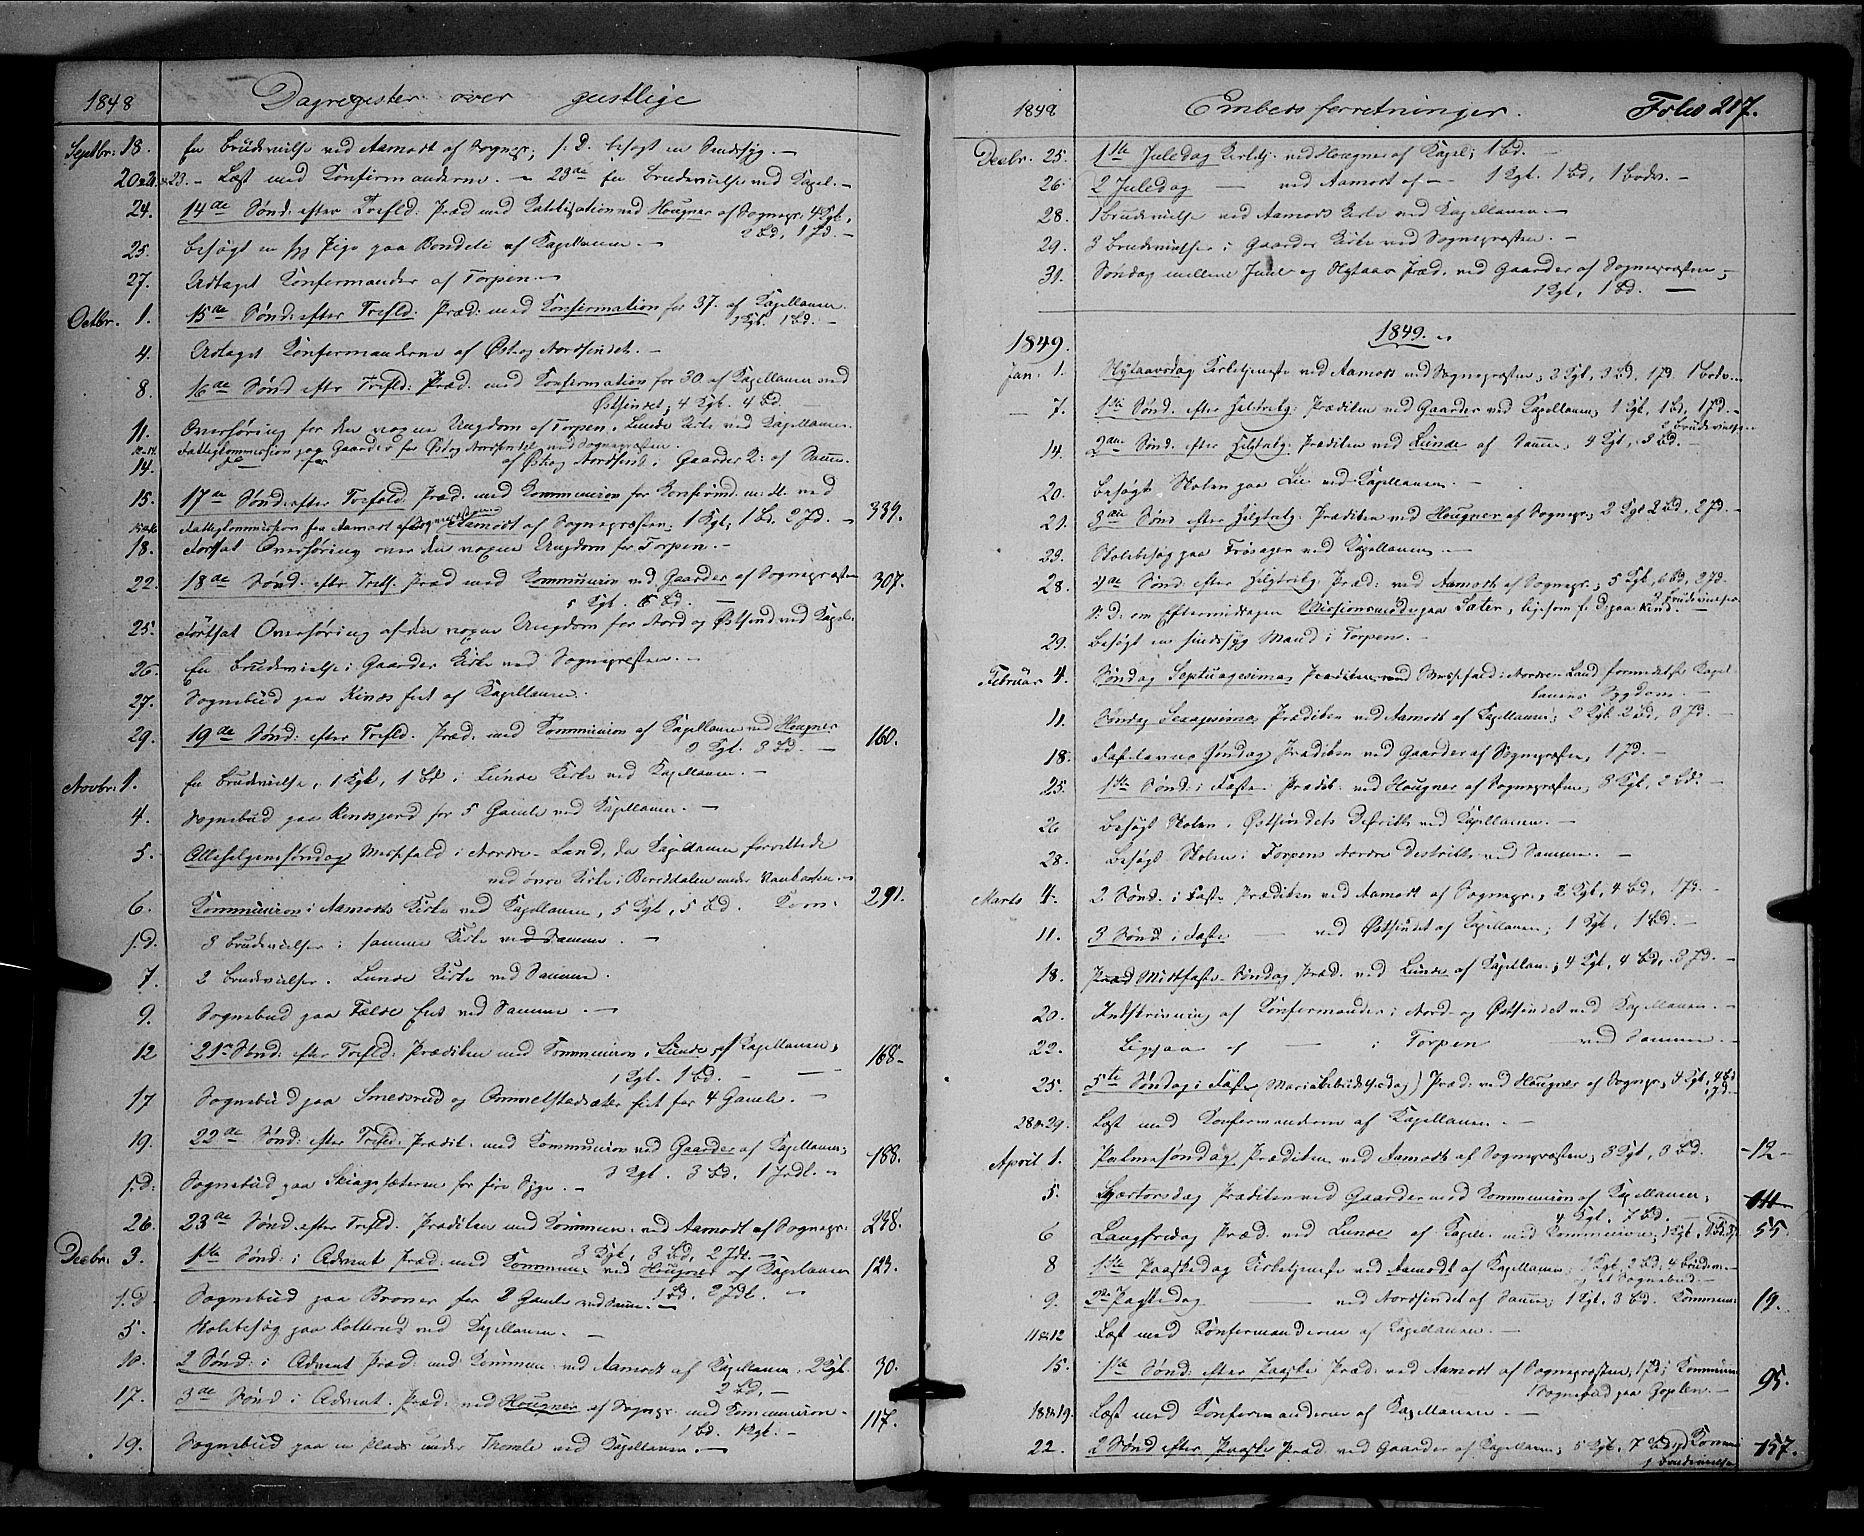 SAH, Land prestekontor, Ministerialbok nr. 10, 1847-1859, s. 217